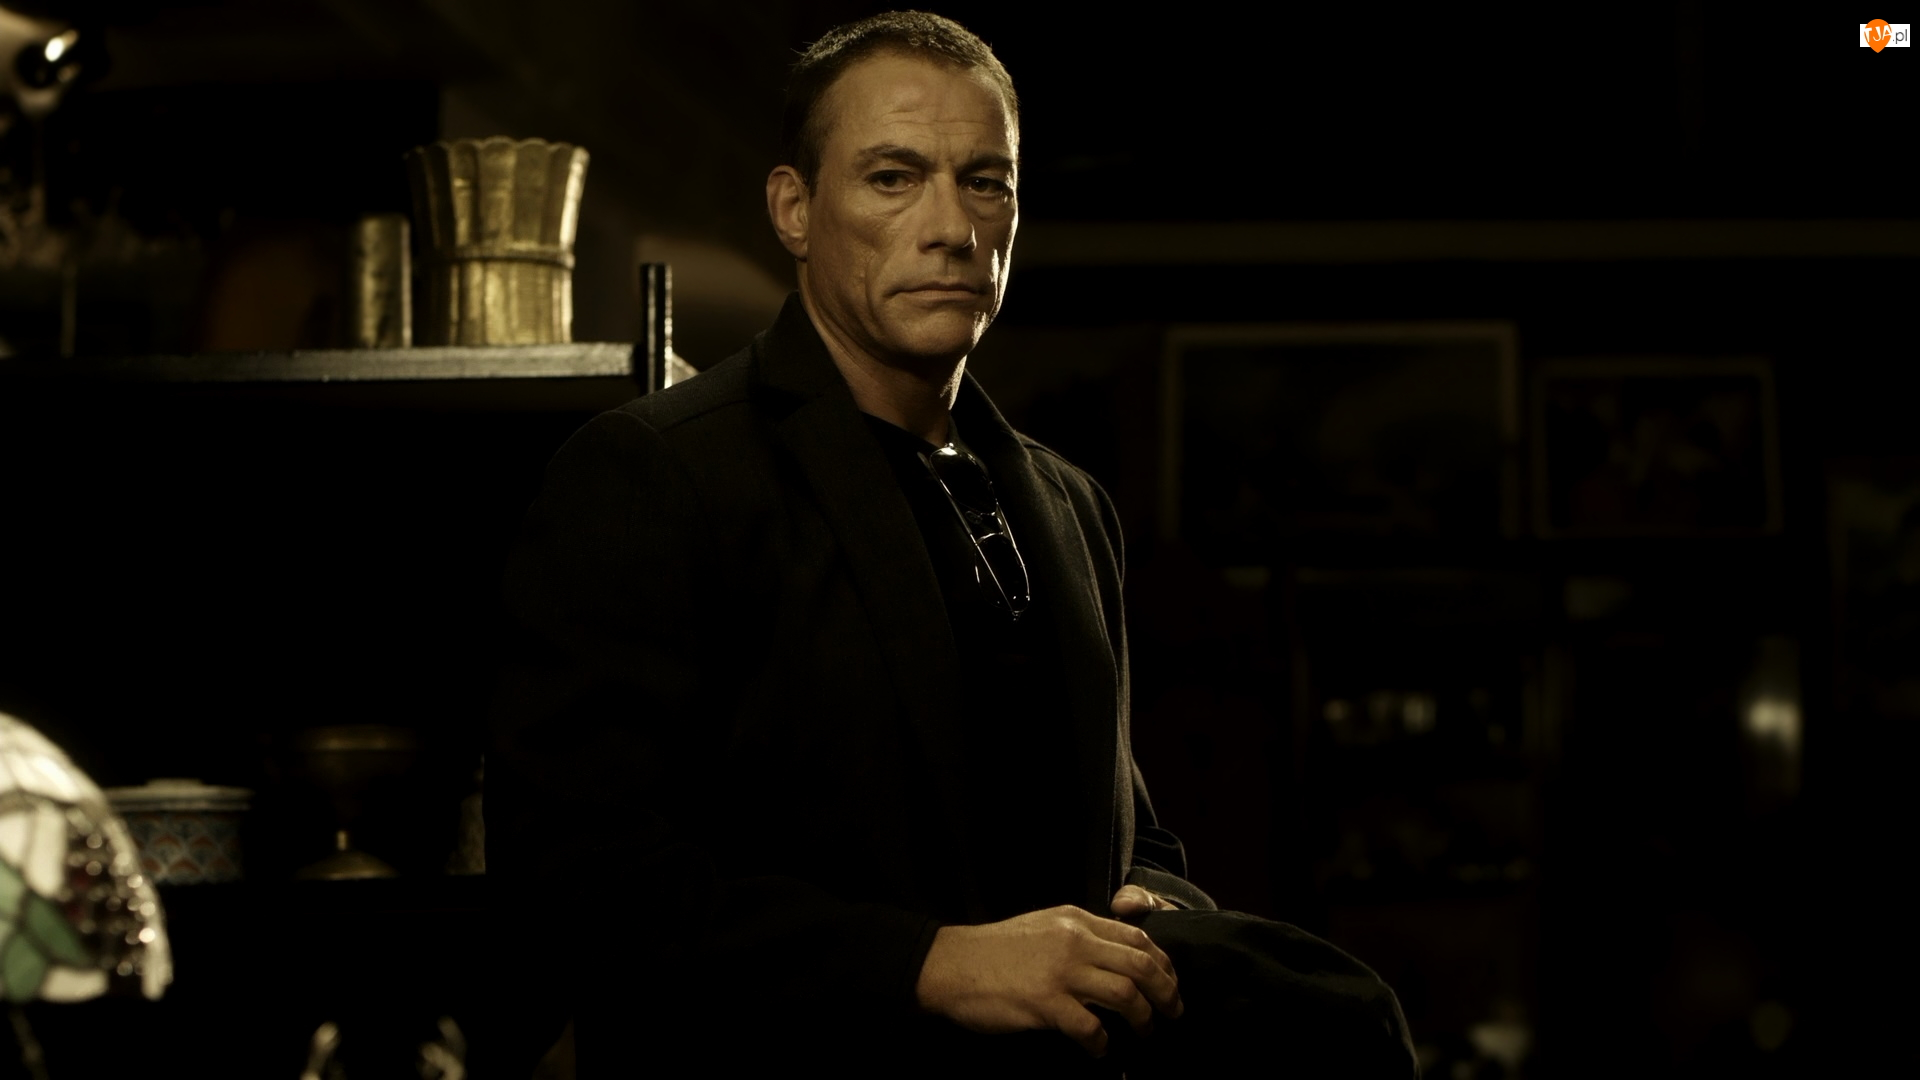 Jean Claude Van Damme, Film, Vincent Brazil, Aktor, Postać, Krzyżowy ogień, Assassination Games